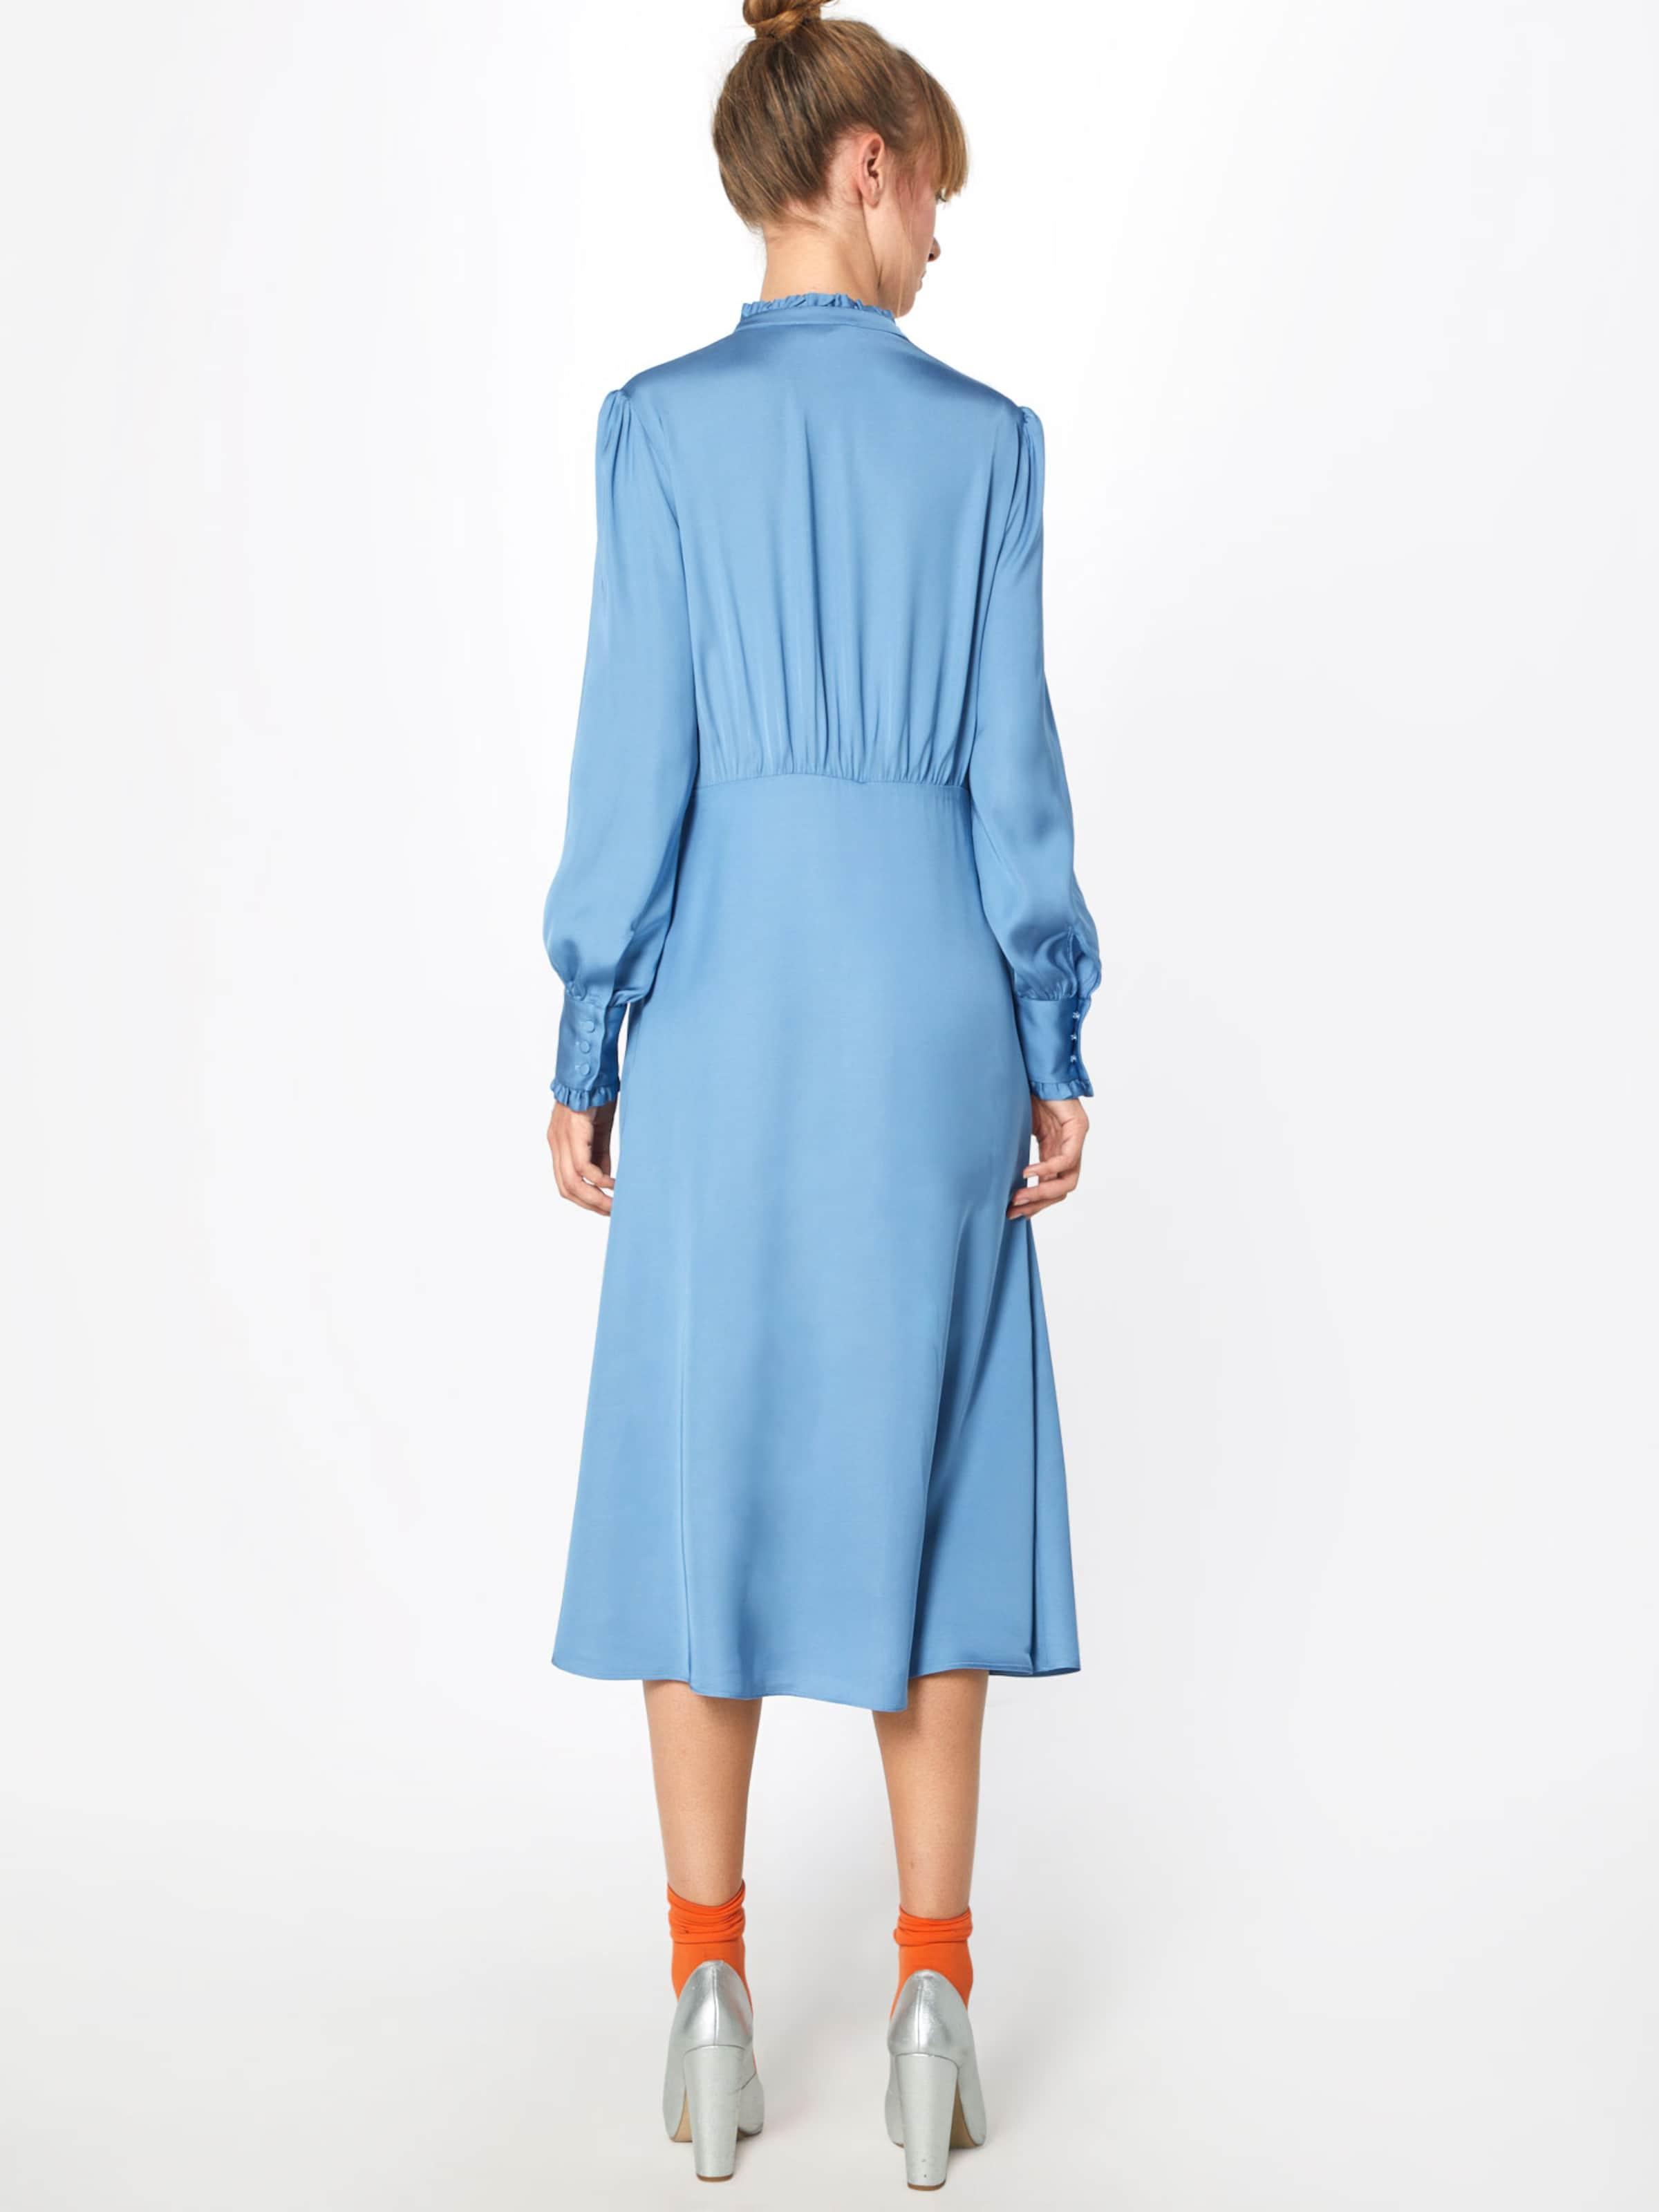 'lalande' Joe Paulamp; Hellblau Kleid In 3c4Aqj5LR